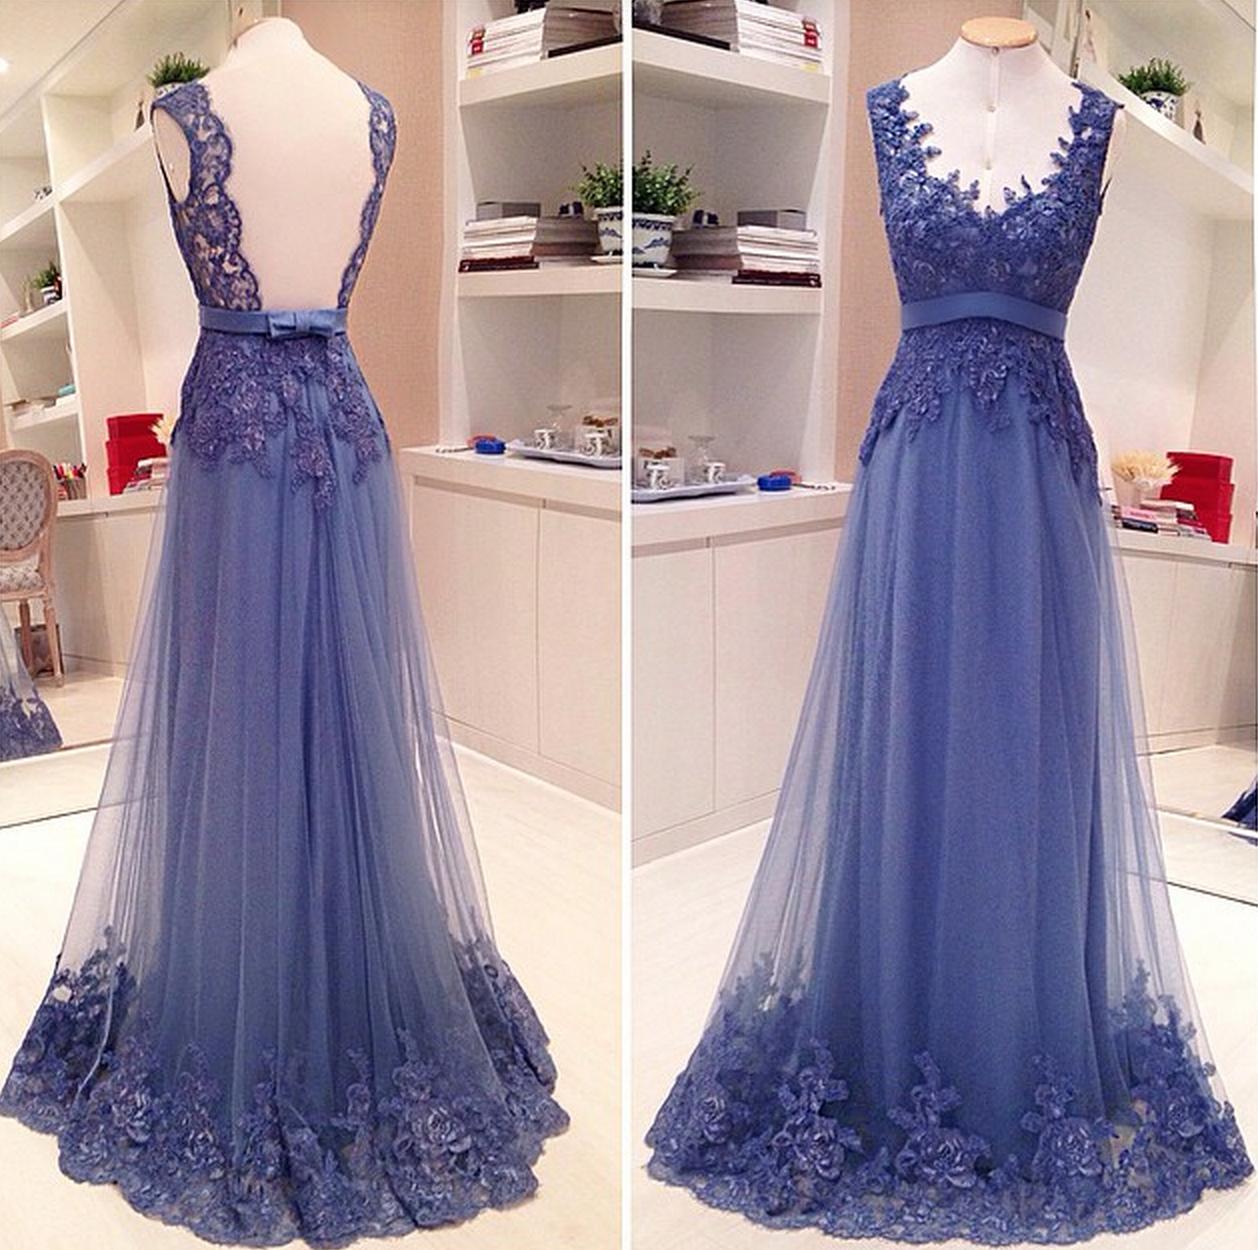 Isabella Narchi dress | Dress | Pinterest | Vestiditos, Vestidos de ...